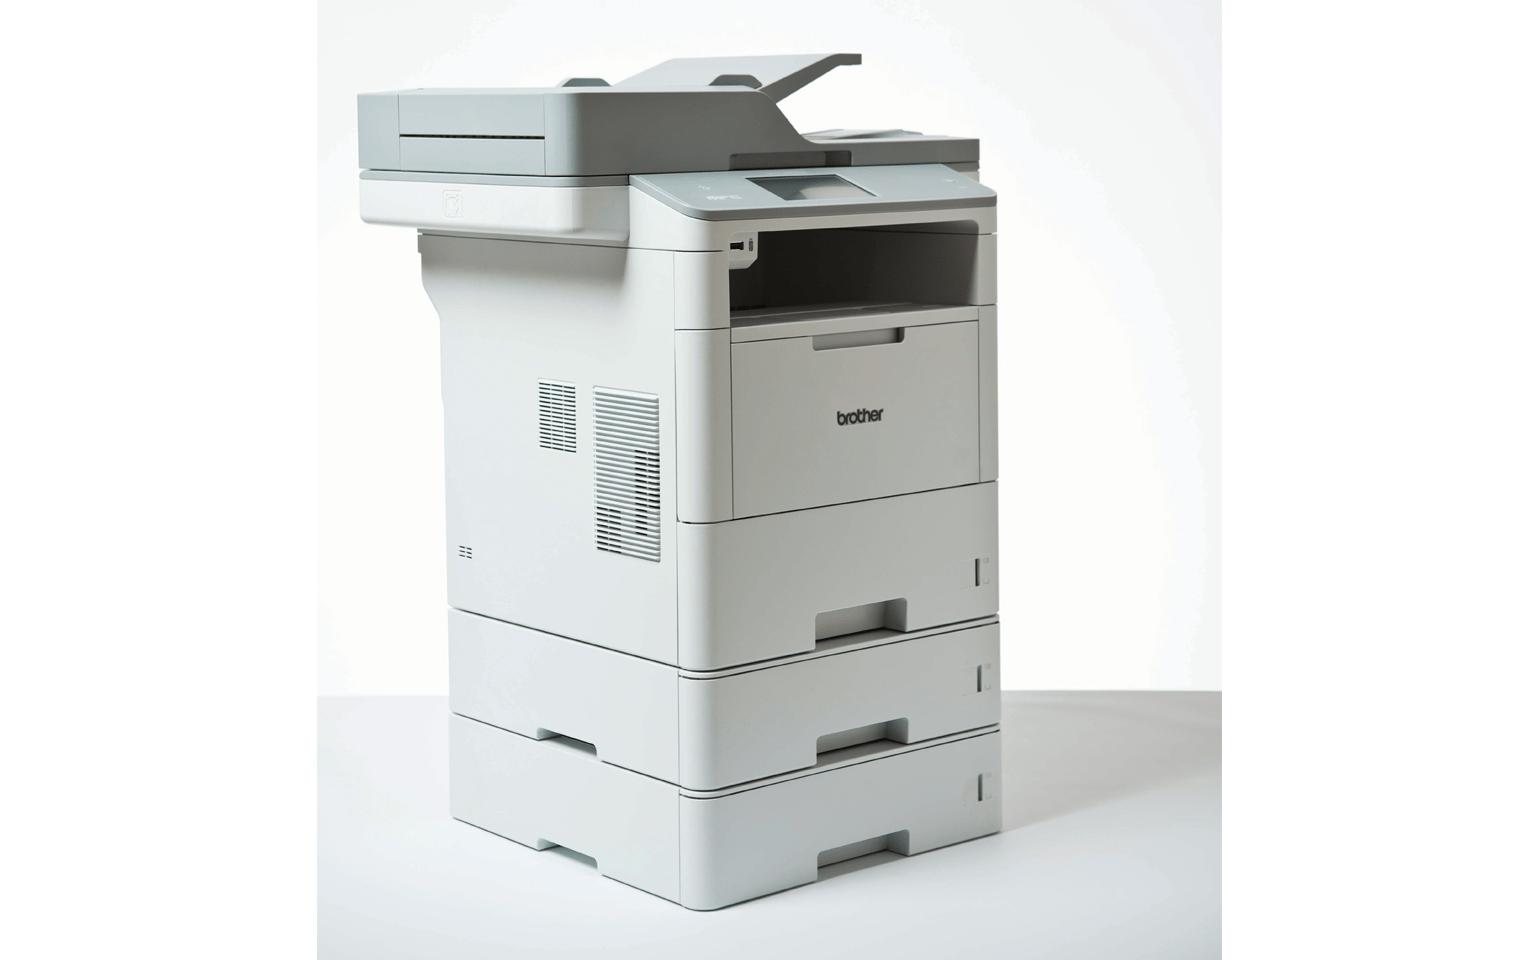 MFC-L6900DWT Wireless Mono Laser Printer 2